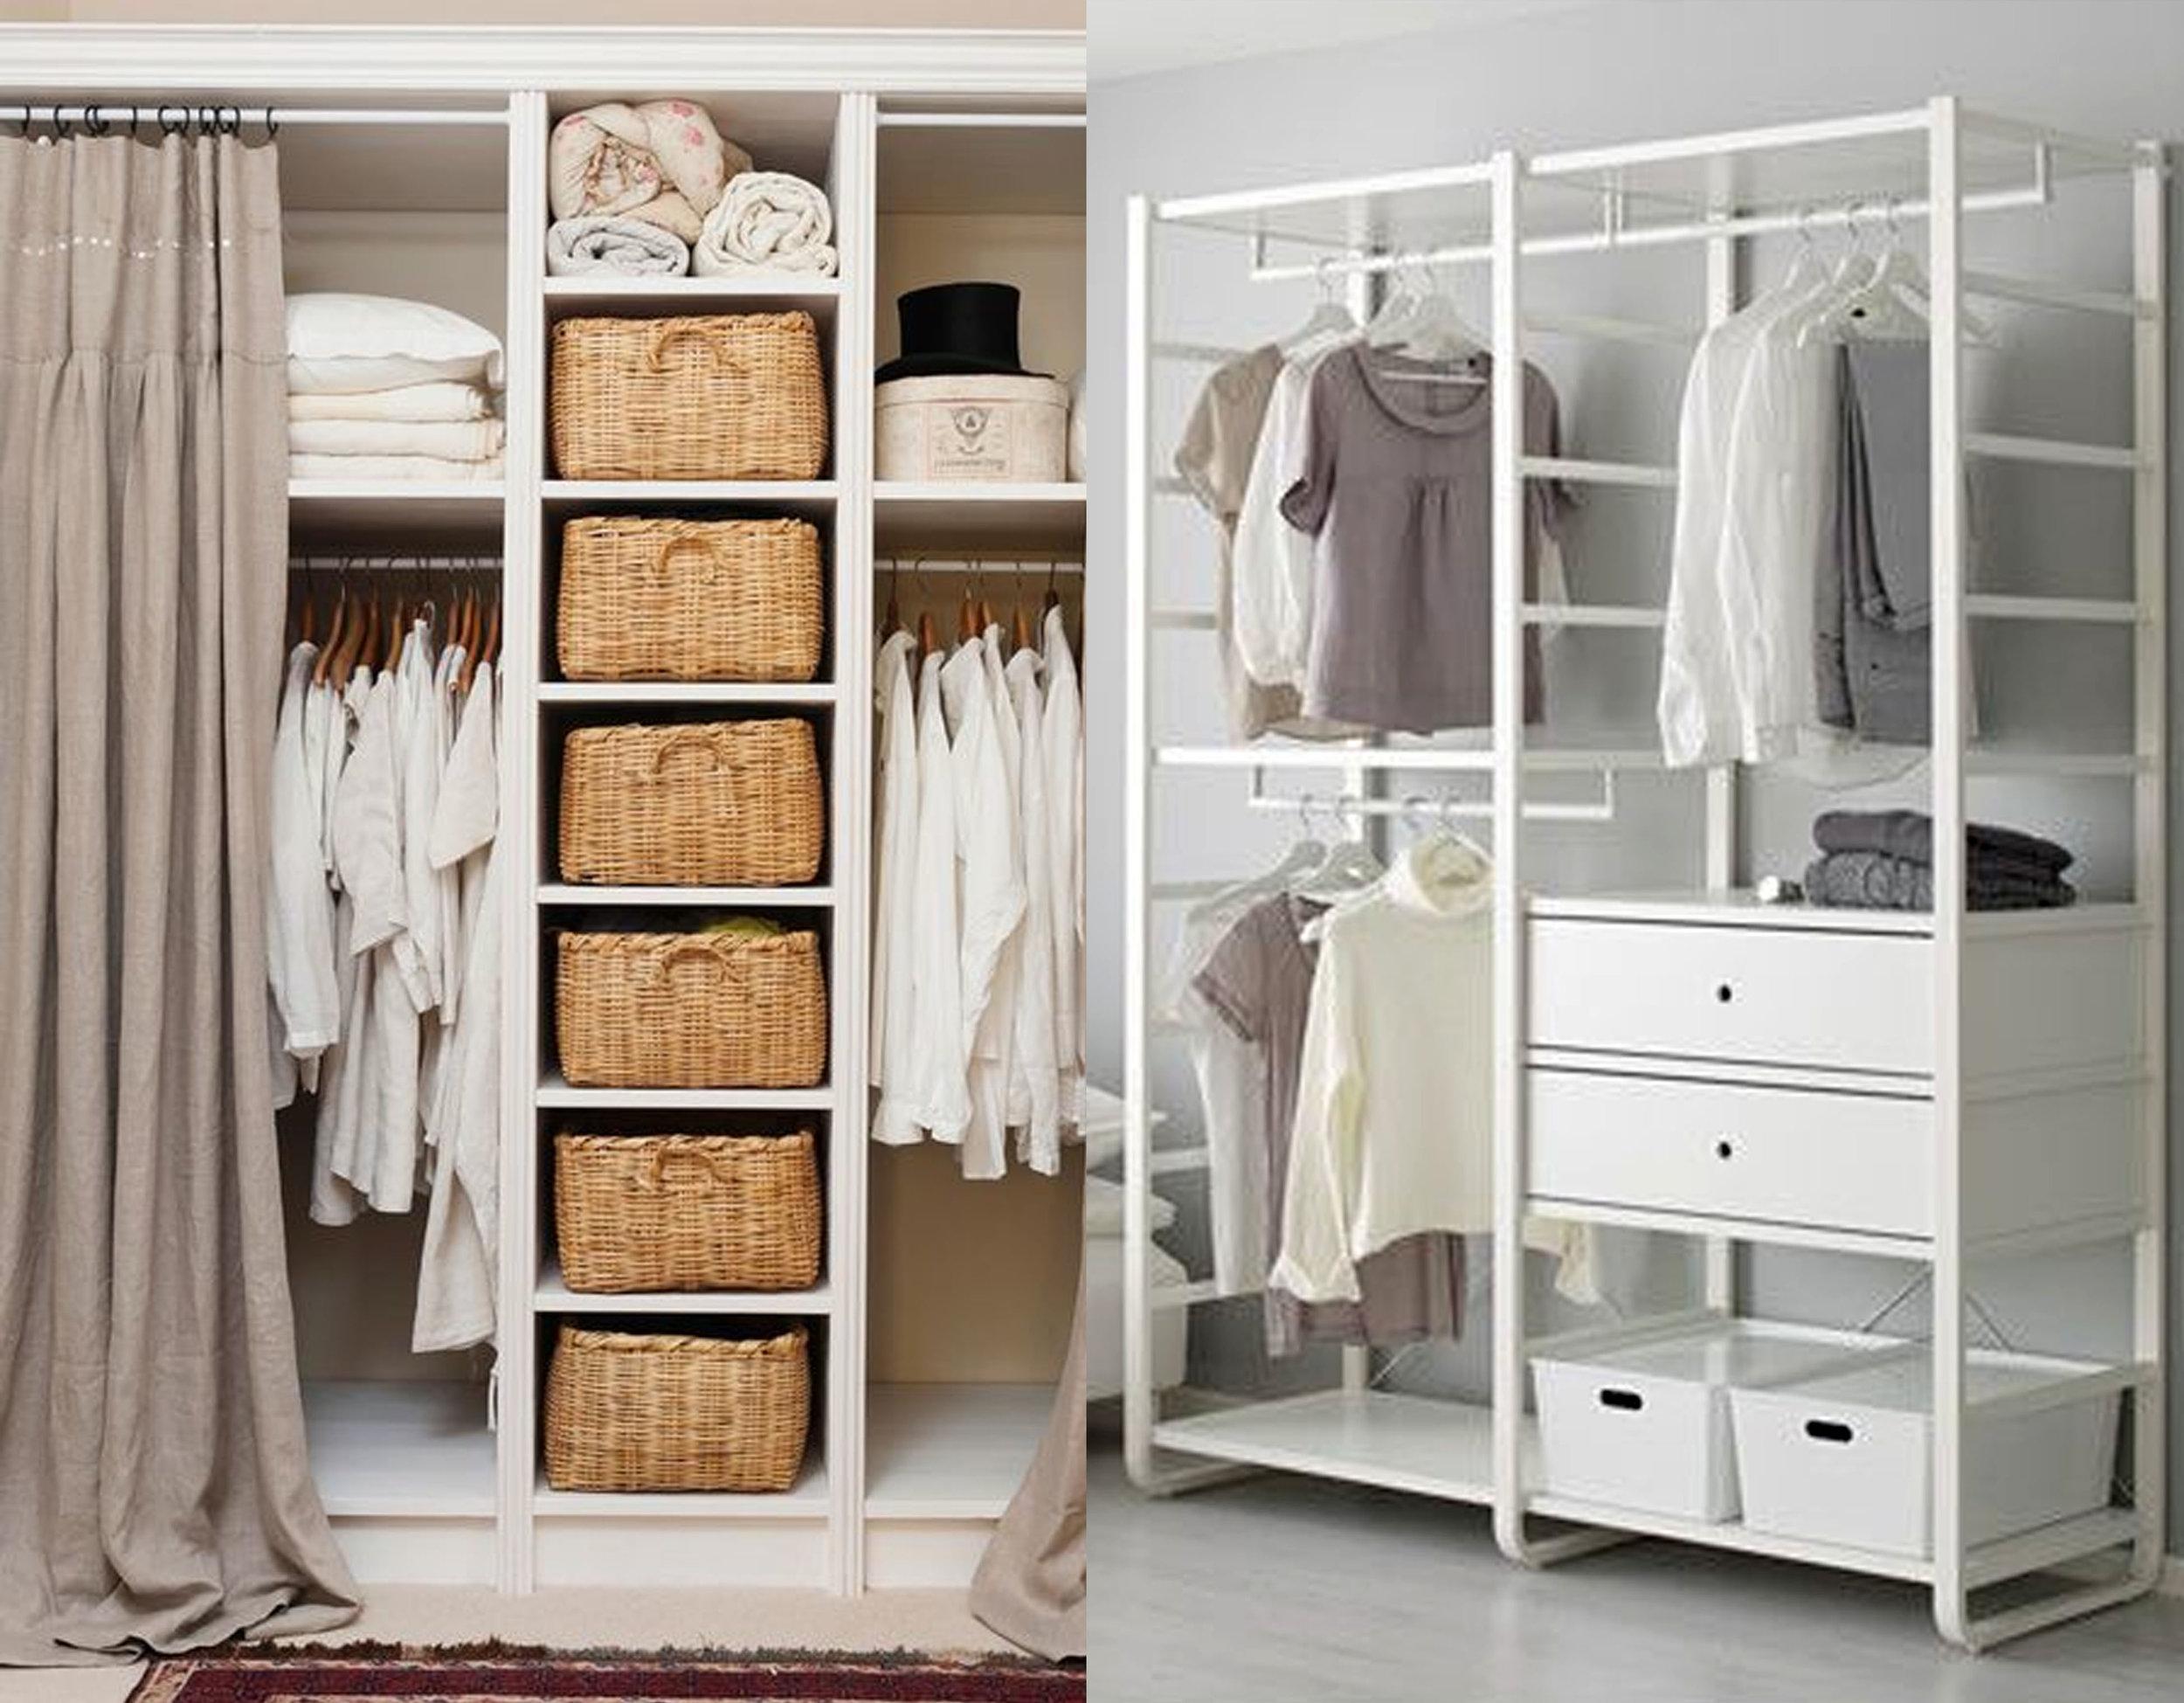 image dressing via  Pinterest  - clothing rack Elvarli  IKEA